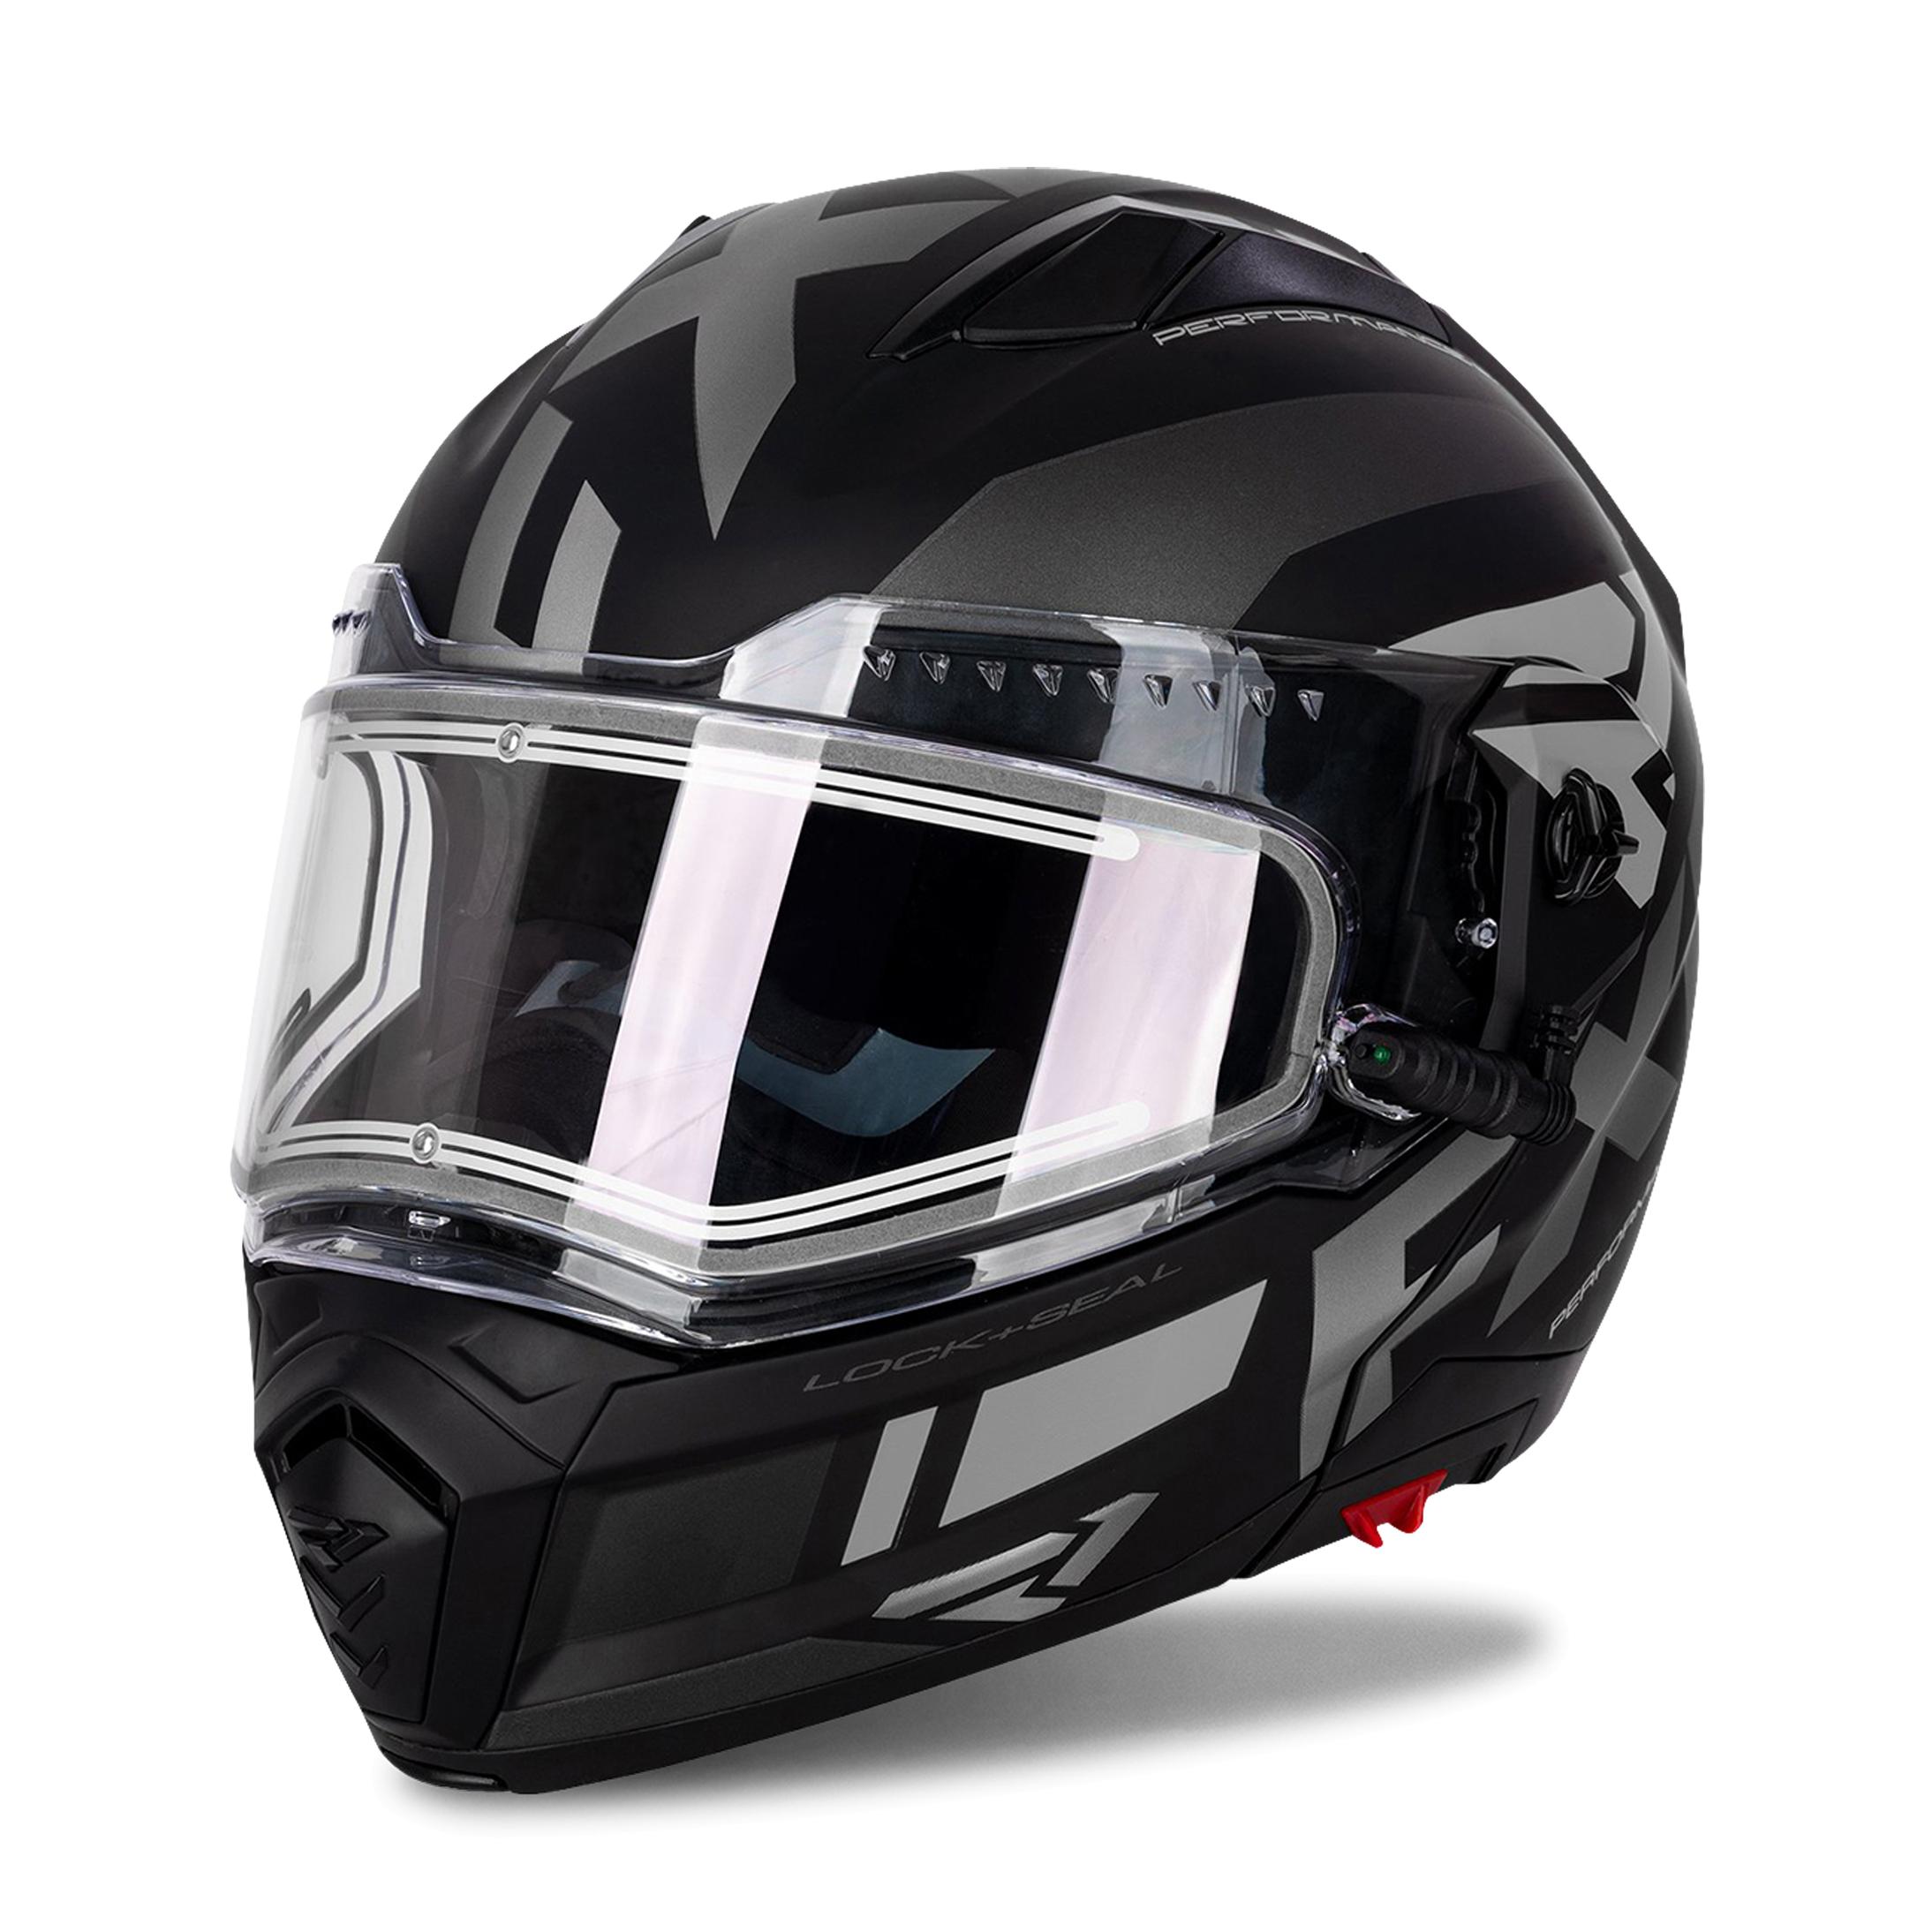 FXR Casco Maverick Modular Team E Black Ops